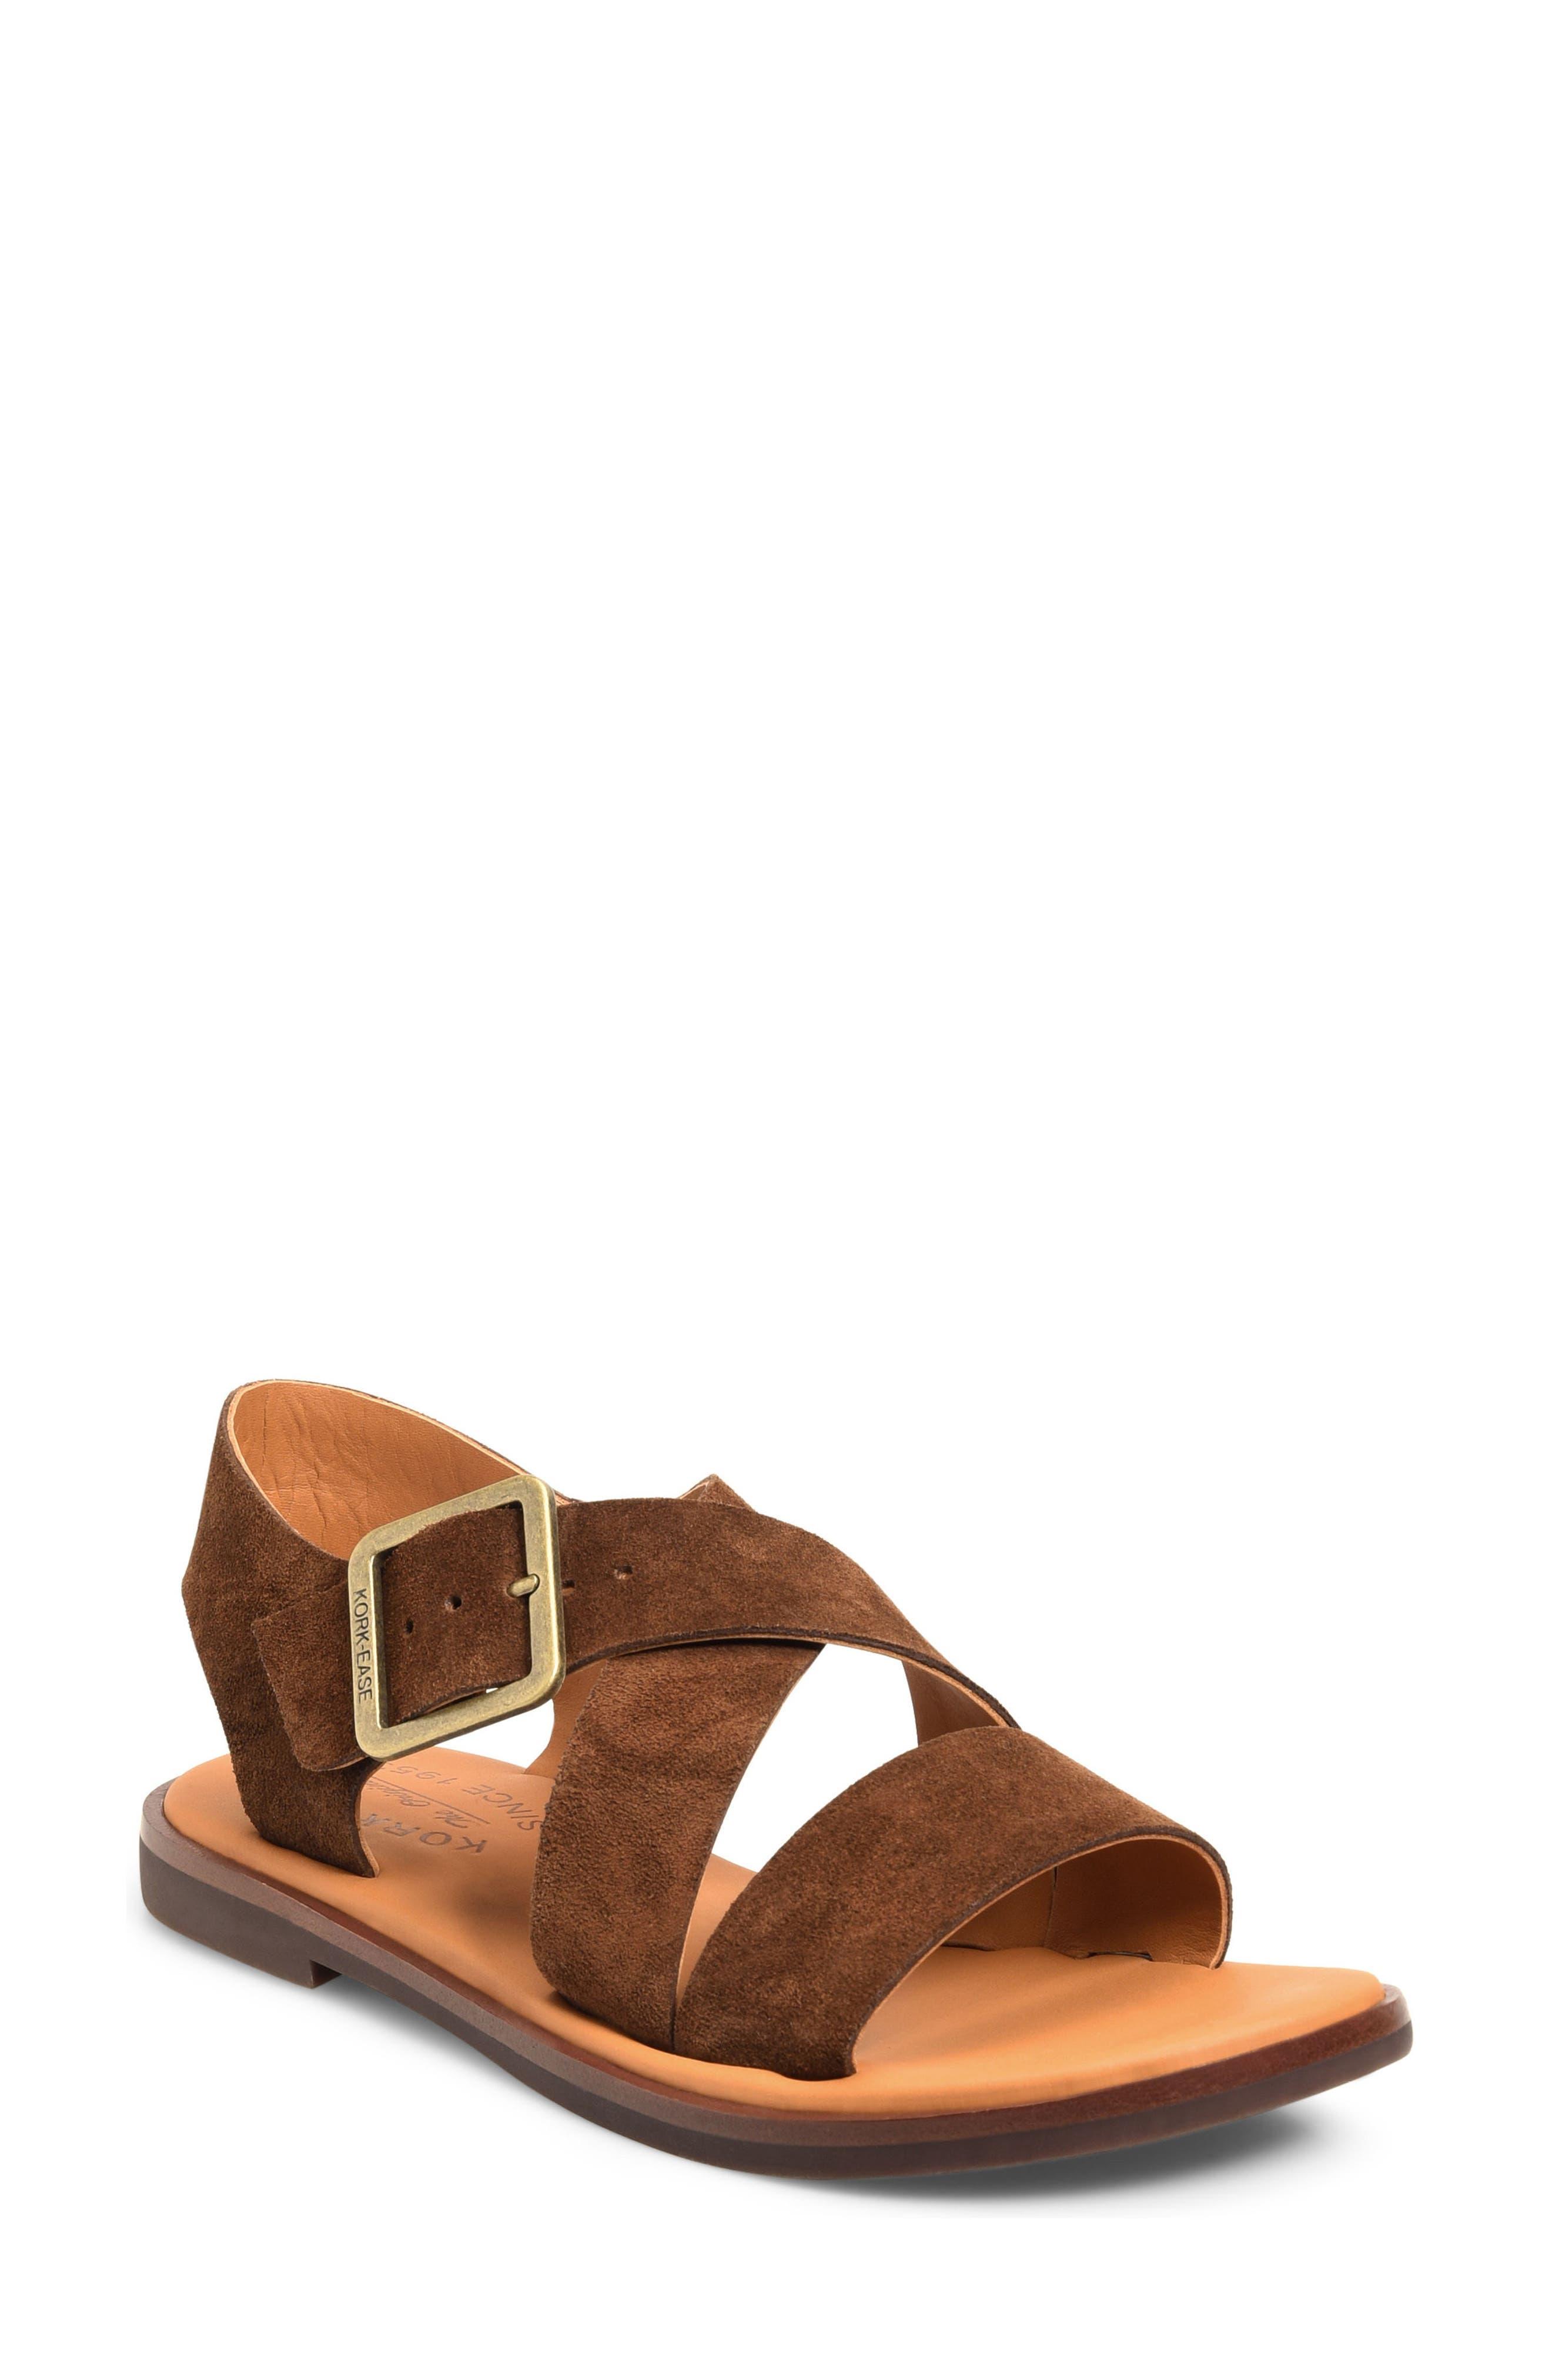 Alternate Image 1 Selected - Kork-Ease® 'Nara' Flat Sandal (Women)